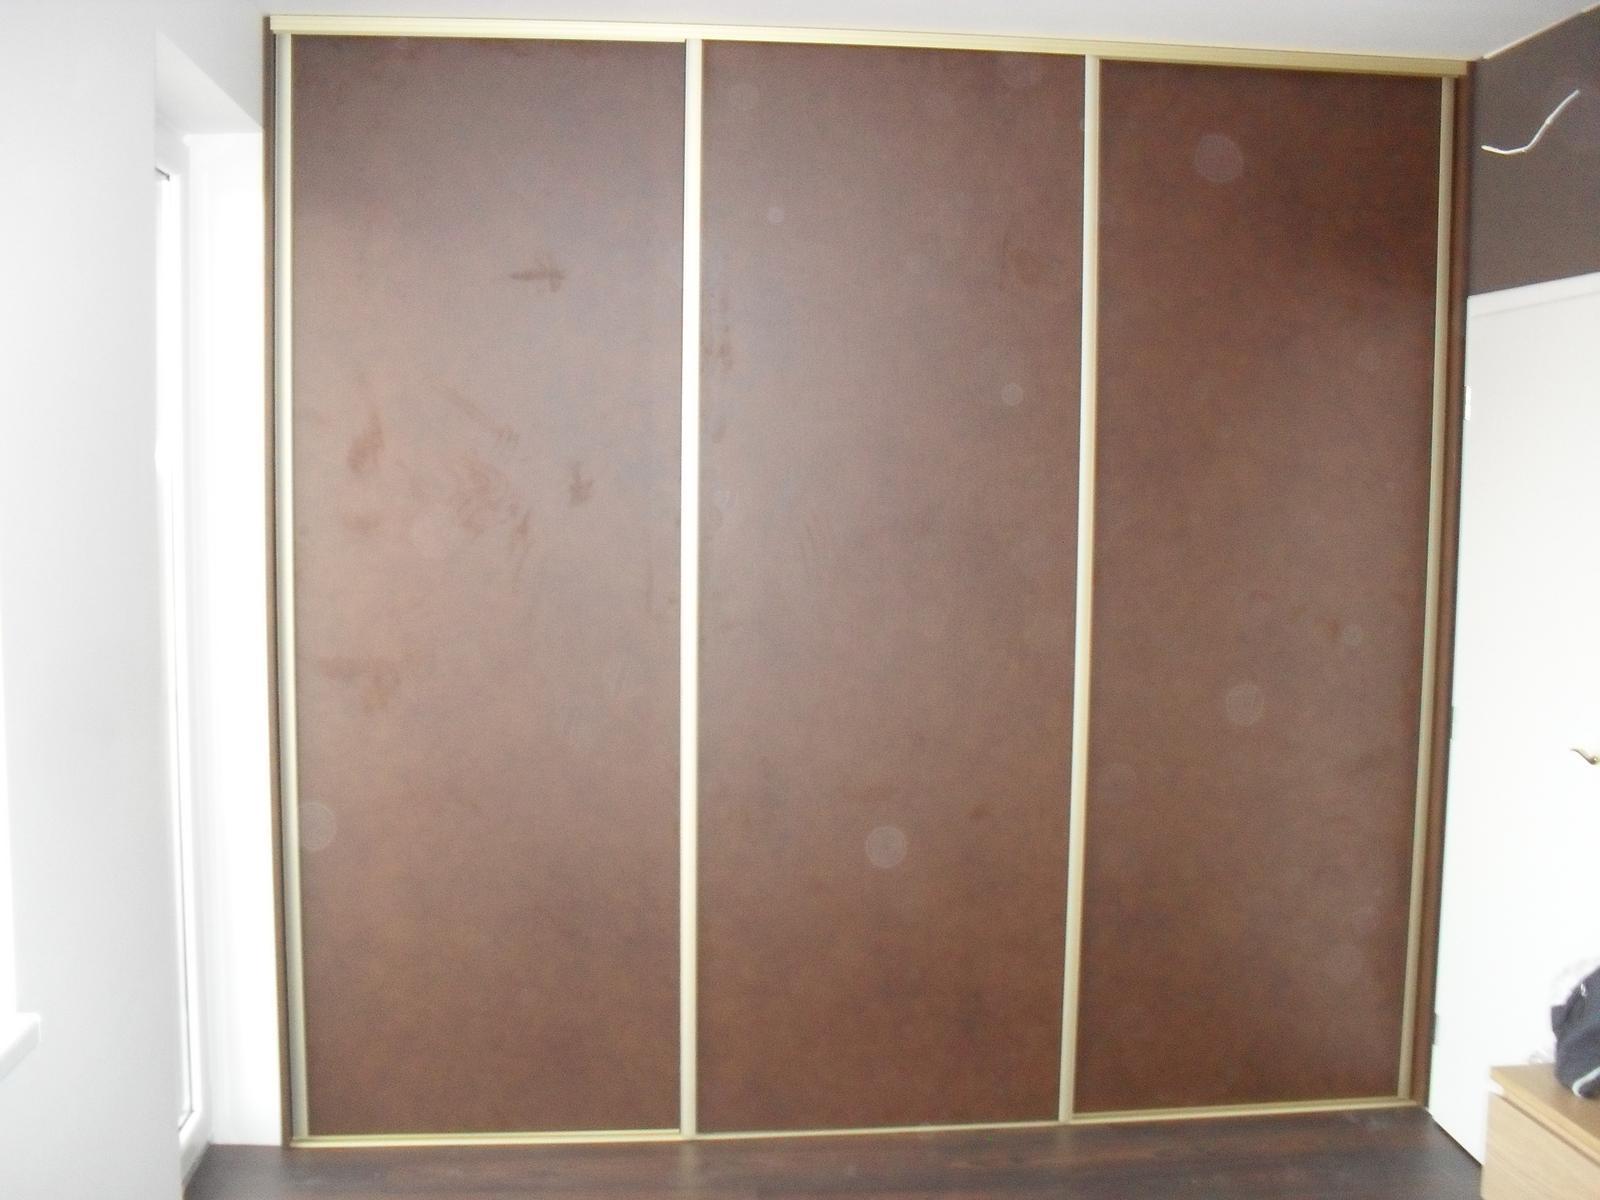 Vstavané skrine Martin Benko Bošany - Obrázok č. 128